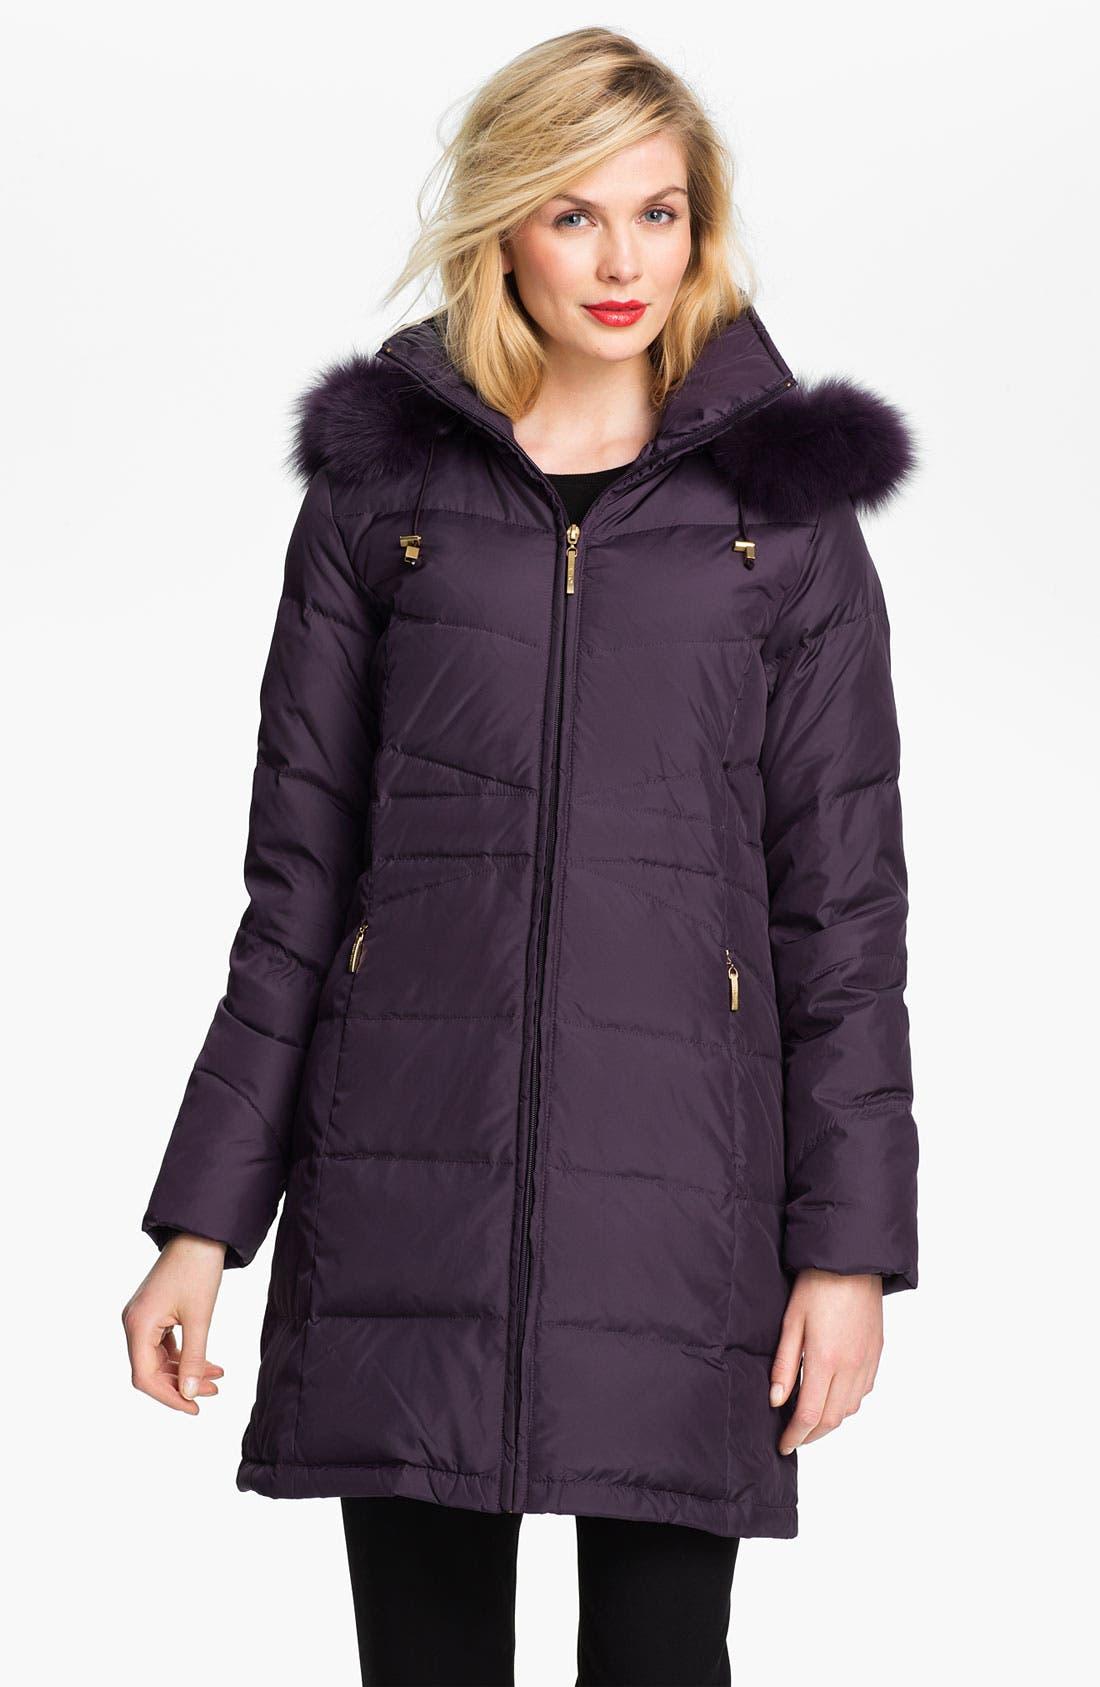 Alternate Image 1 Selected - Ellen Tracy Genuine Fox Fur Trim Down Coat (Nordstrom Exclusive)